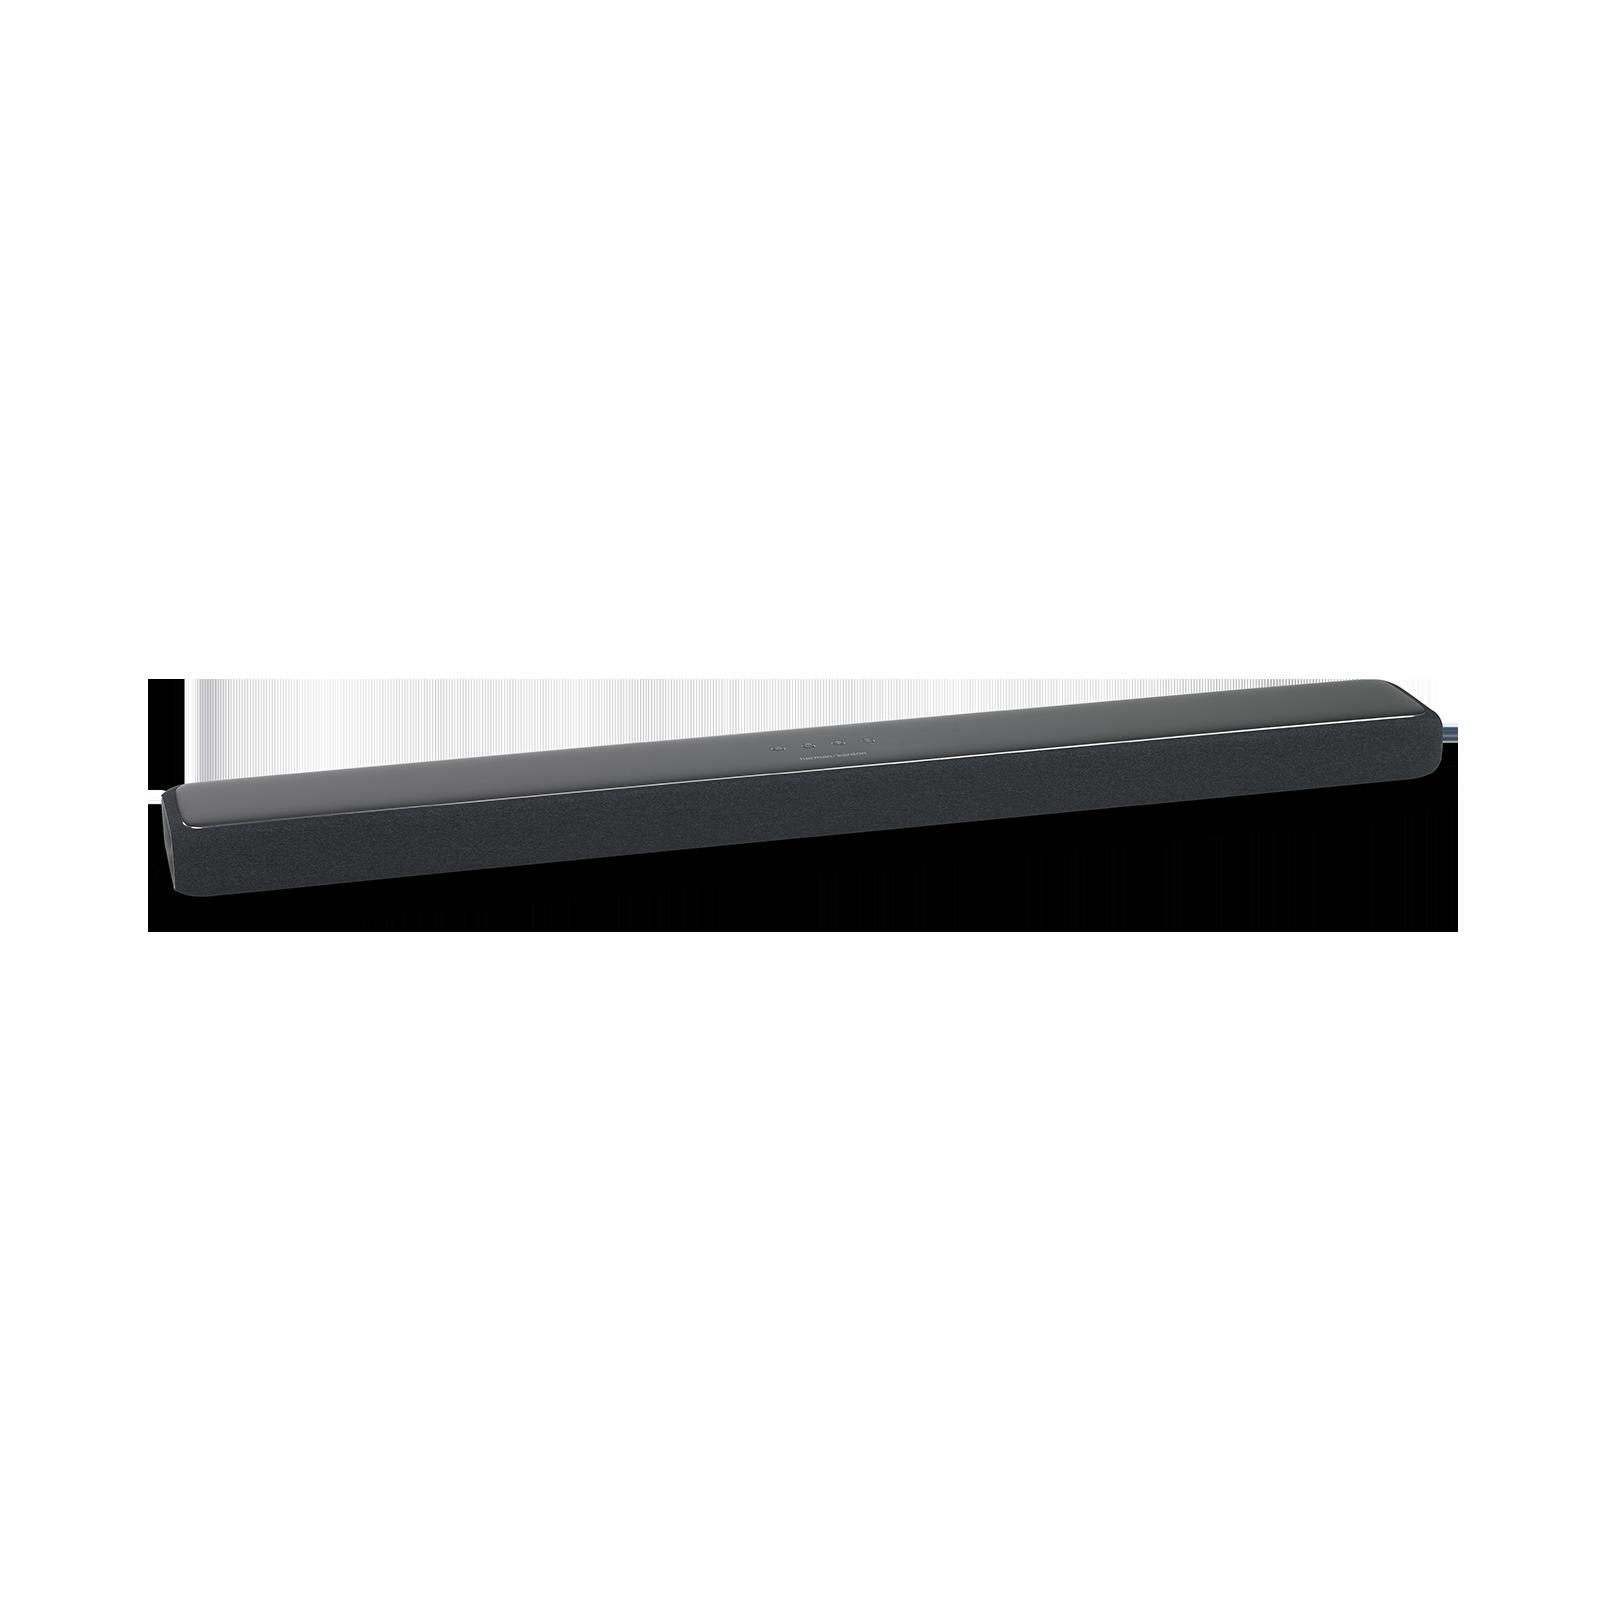 Enchant 1300 - Graphite - All in One 13-Channel Soundbar with MultiBeam™ Surround Sound - Hero